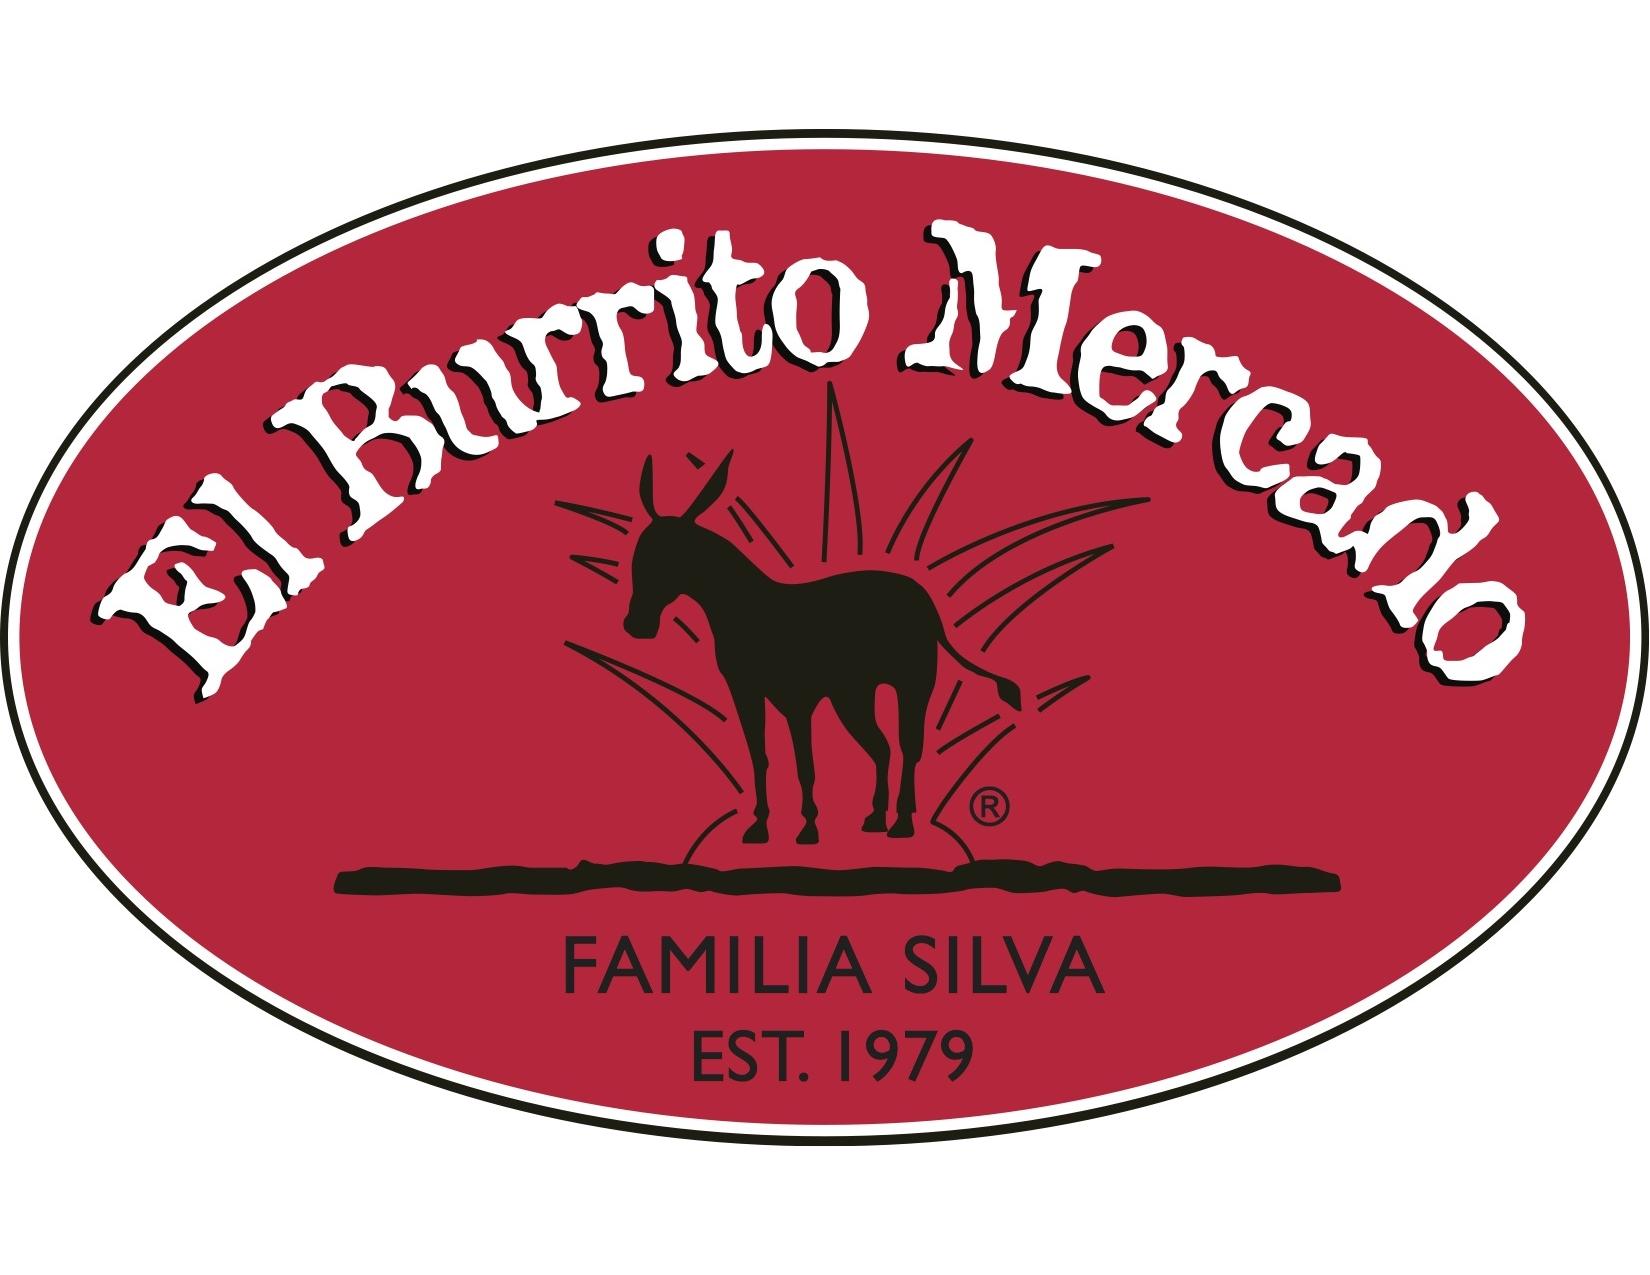 El Burrito Merc Logo_white_red_black (2).jpg